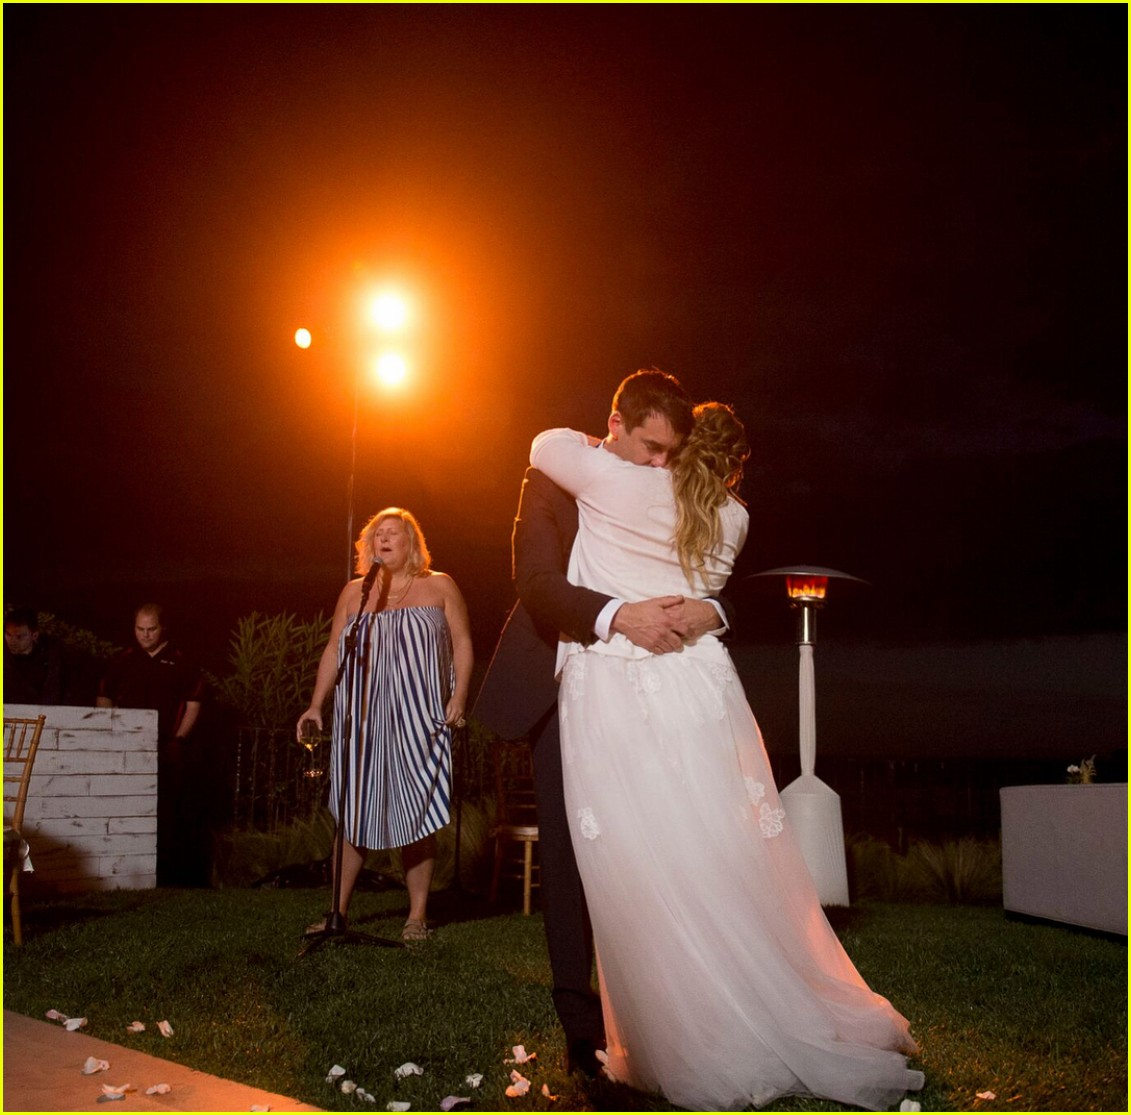 boda amy schumer vestido de novia maquillaje peinado